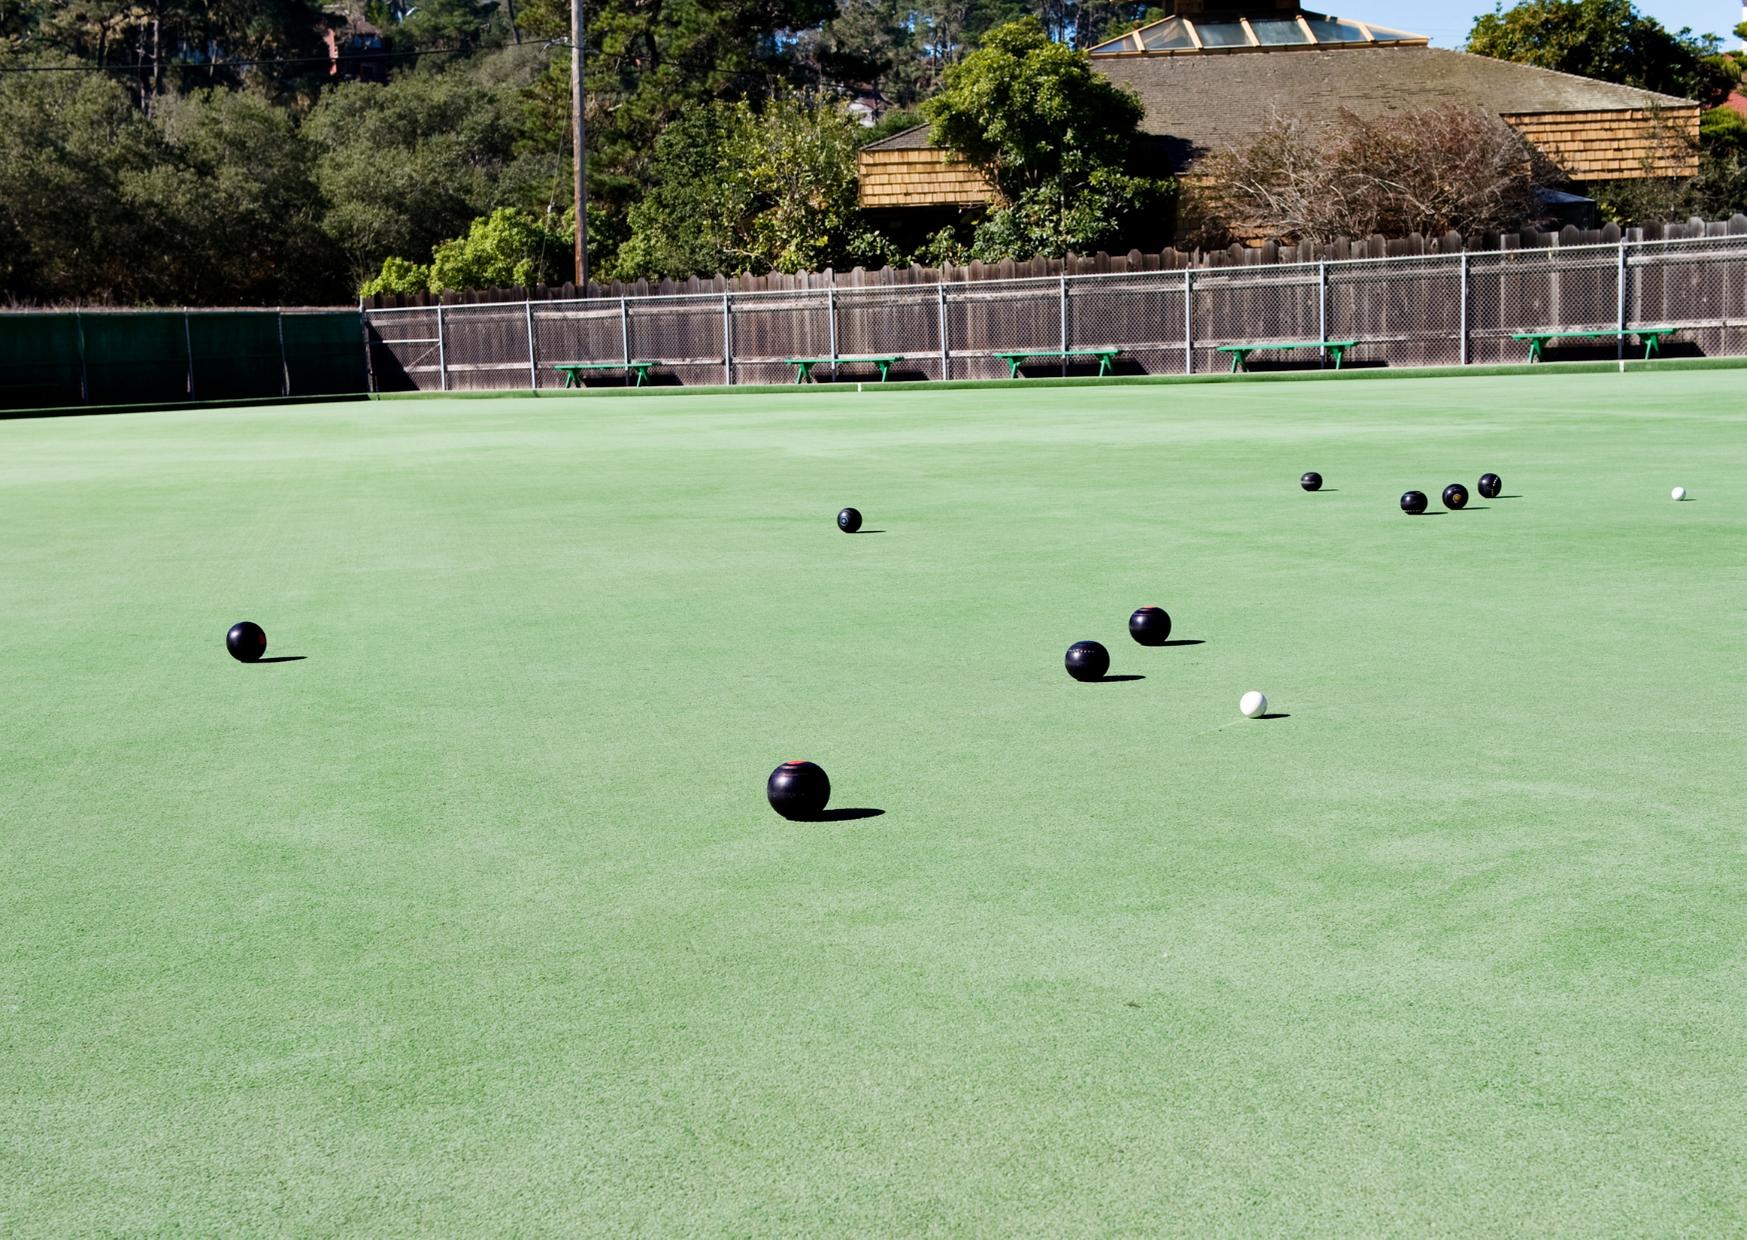 Spider lawn bowls of 4 Alternative Lawn Bowls Games